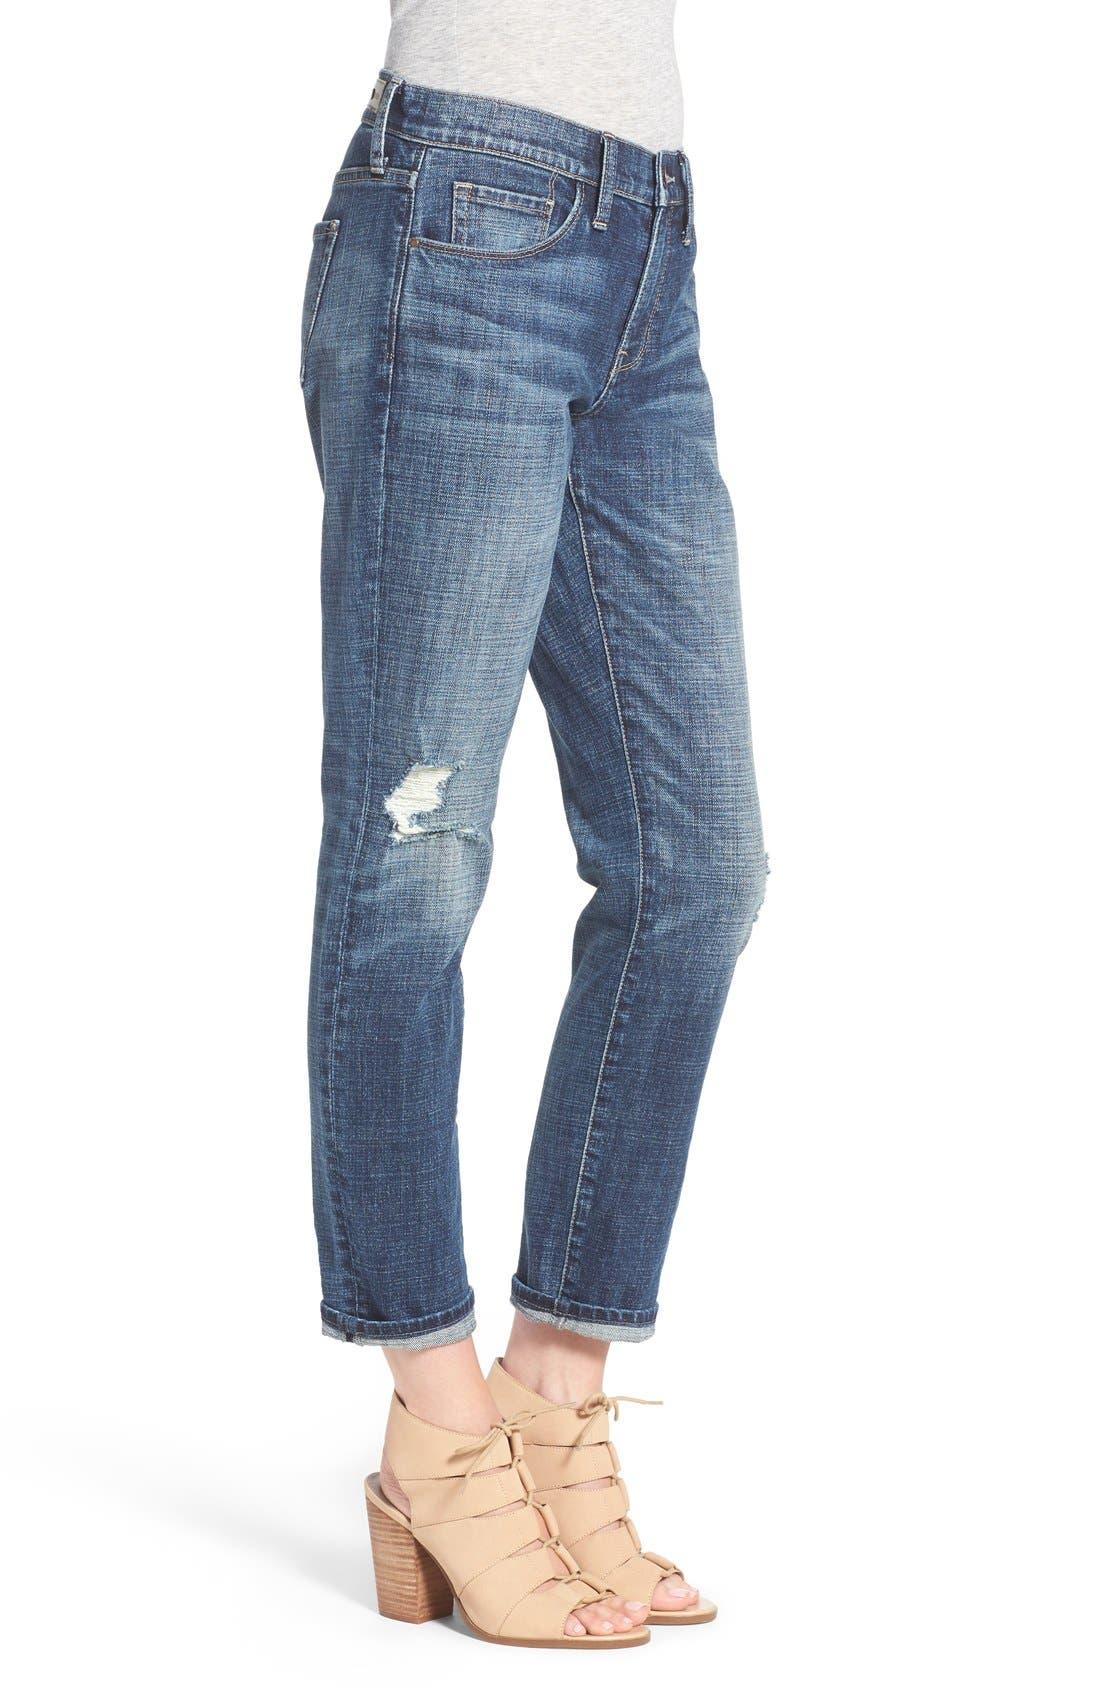 Alternate Image 3  - Treasure&Bond Ankle Boyfriend Jeans (Rustic Dusk Destroy)